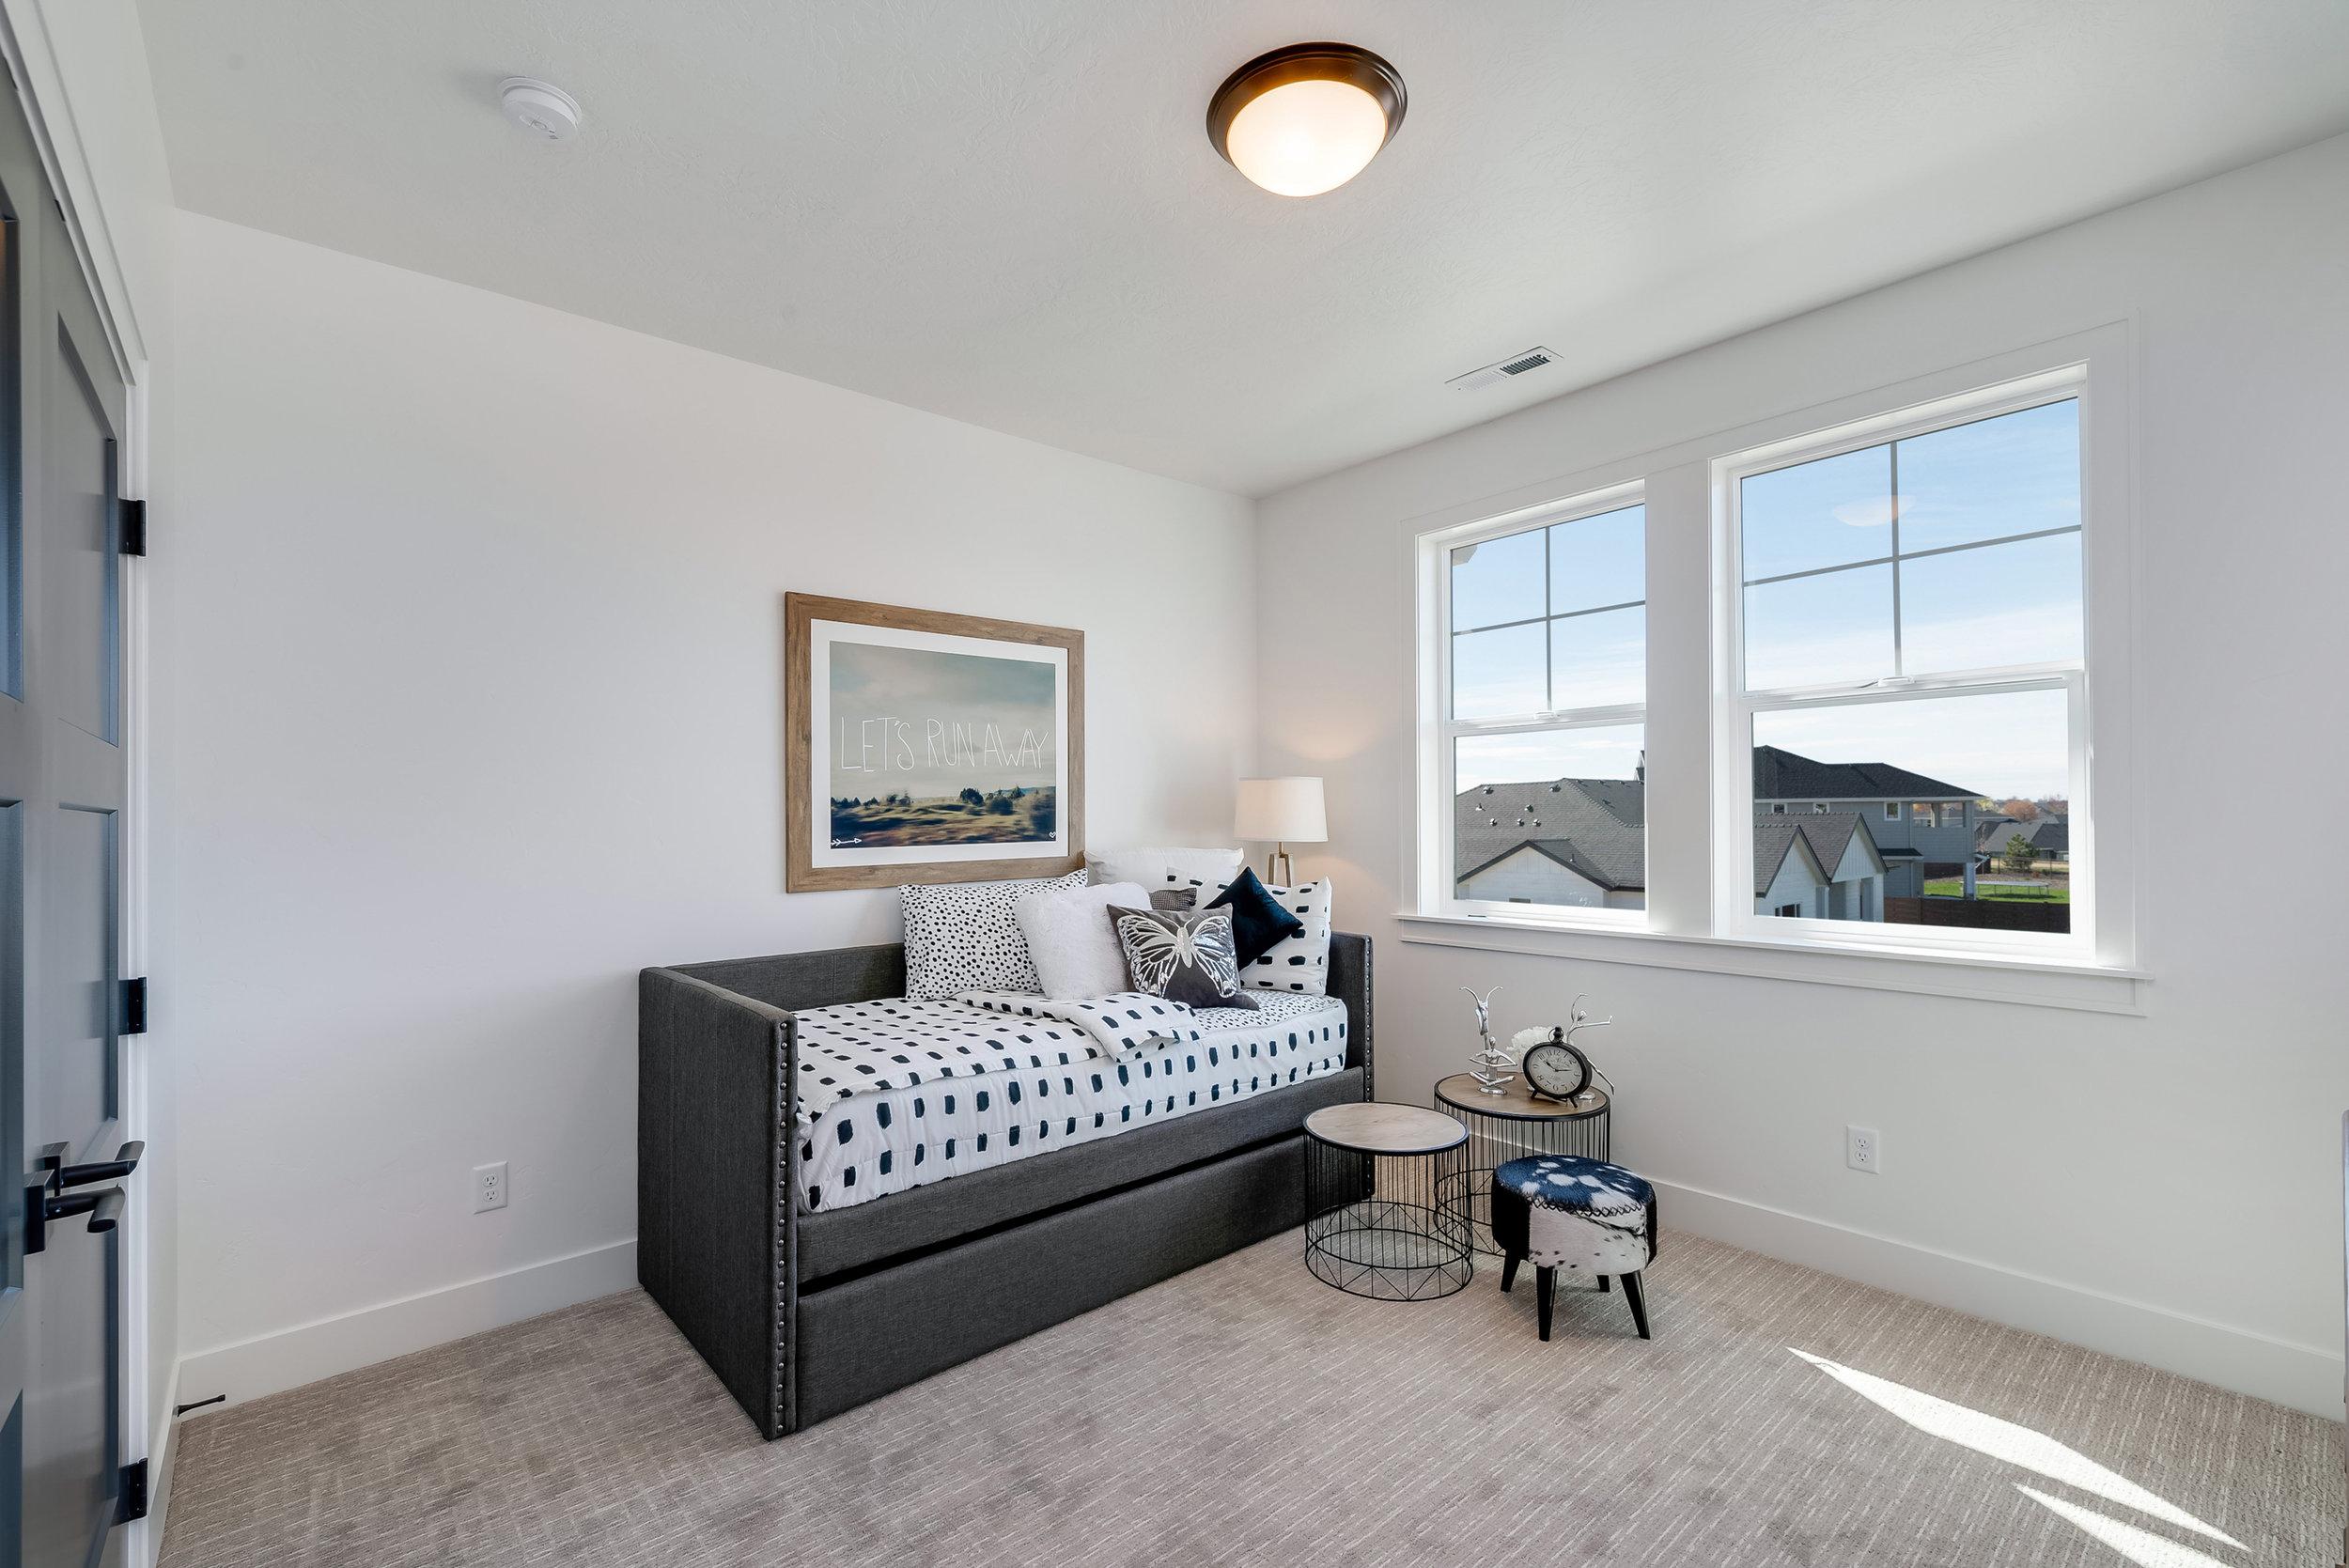 50-Bedroom.jpg